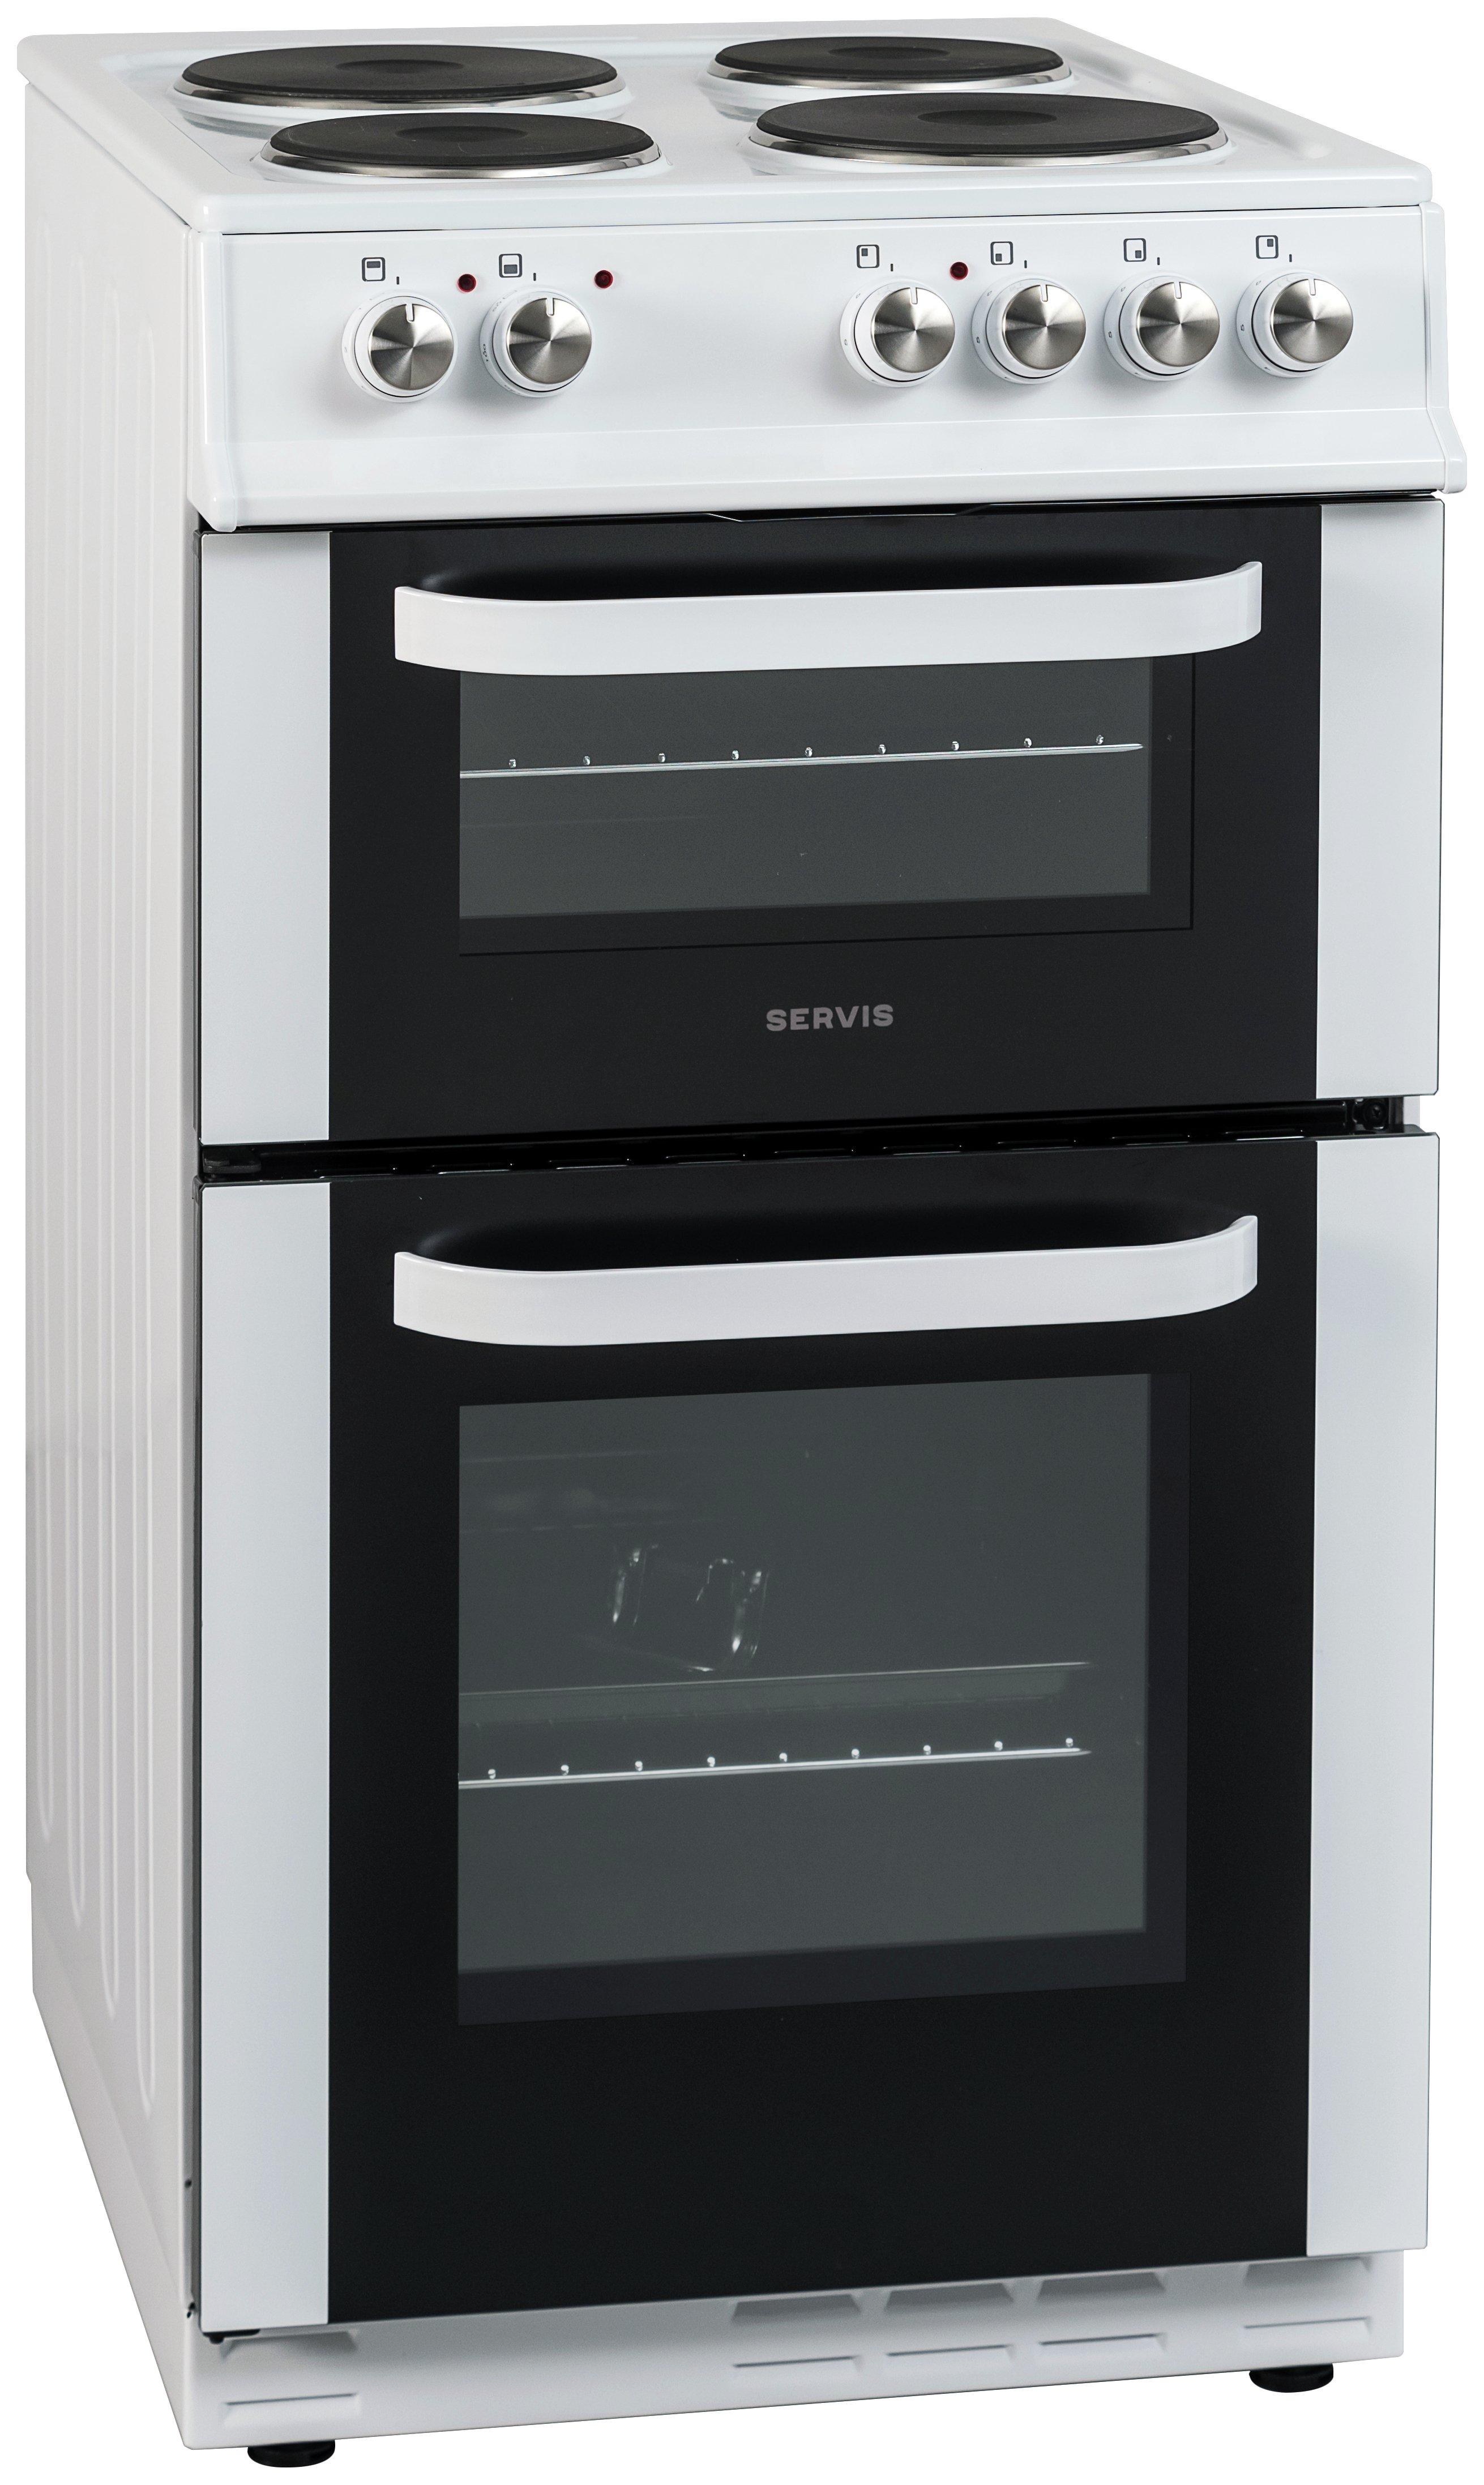 servis dc60w electric cooker white. Black Bedroom Furniture Sets. Home Design Ideas